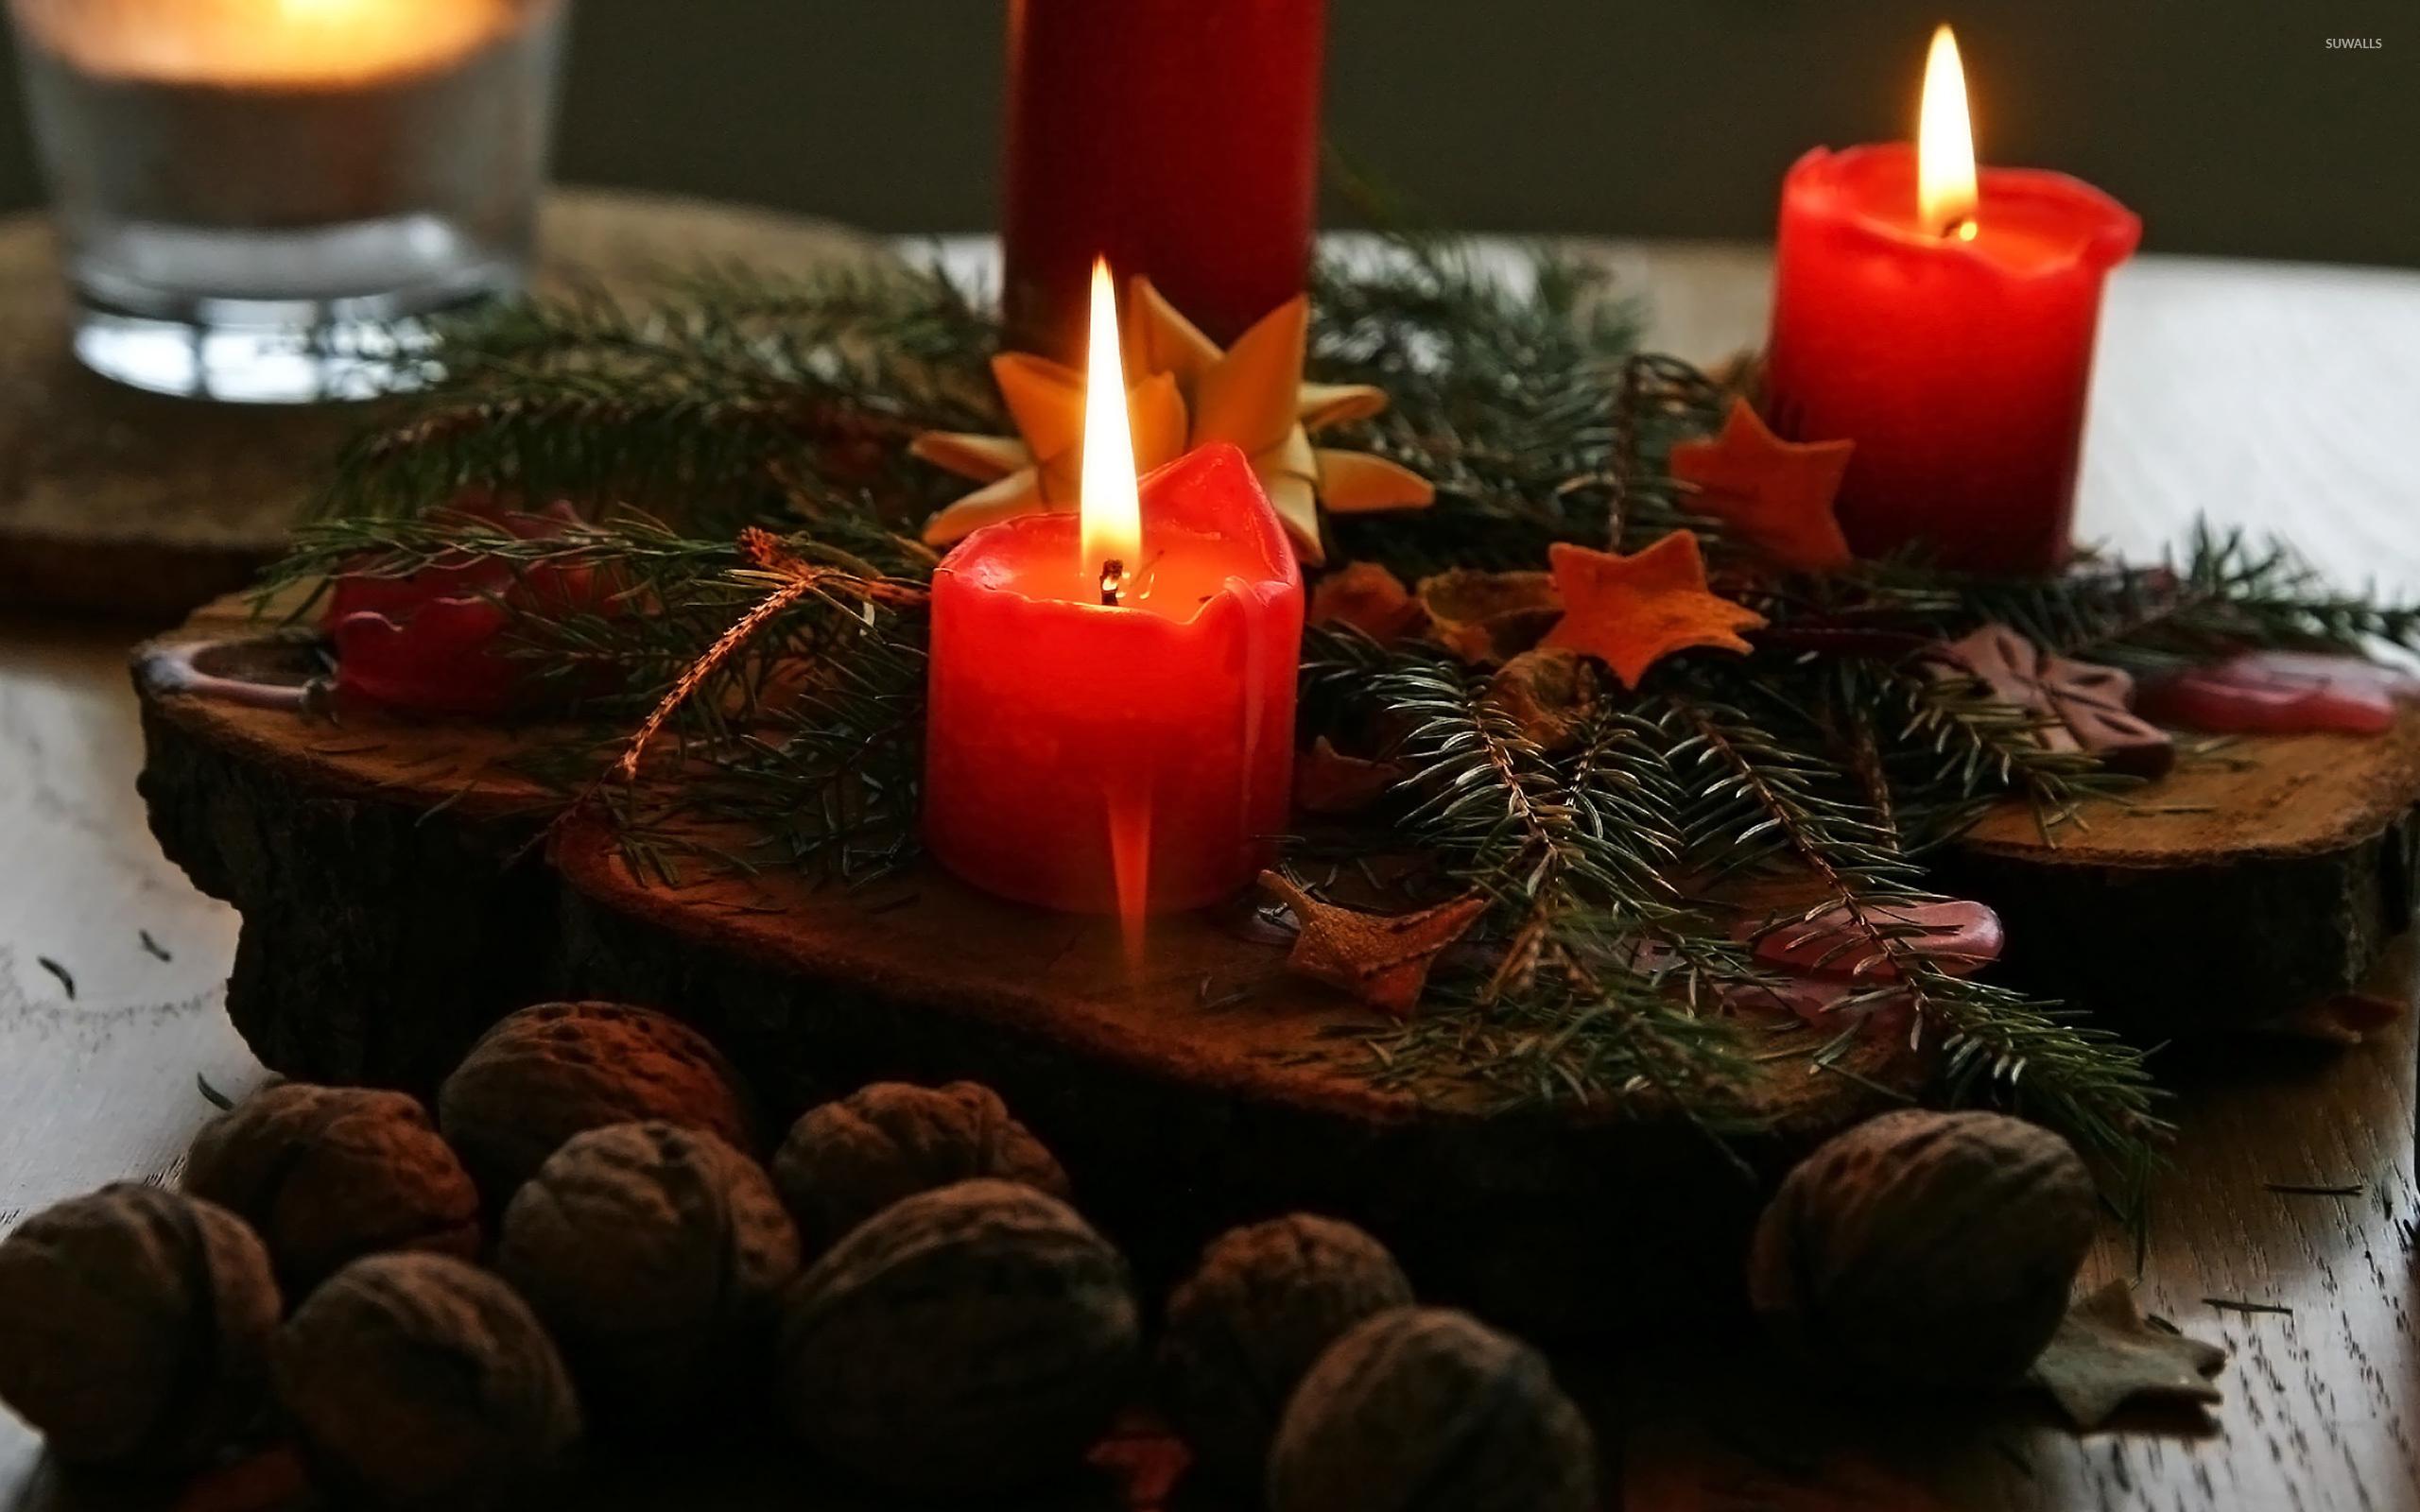 Christmas Candles [2] Wallpaper - Christmas Candle Wallpaper 4k , HD Wallpaper & Backgrounds